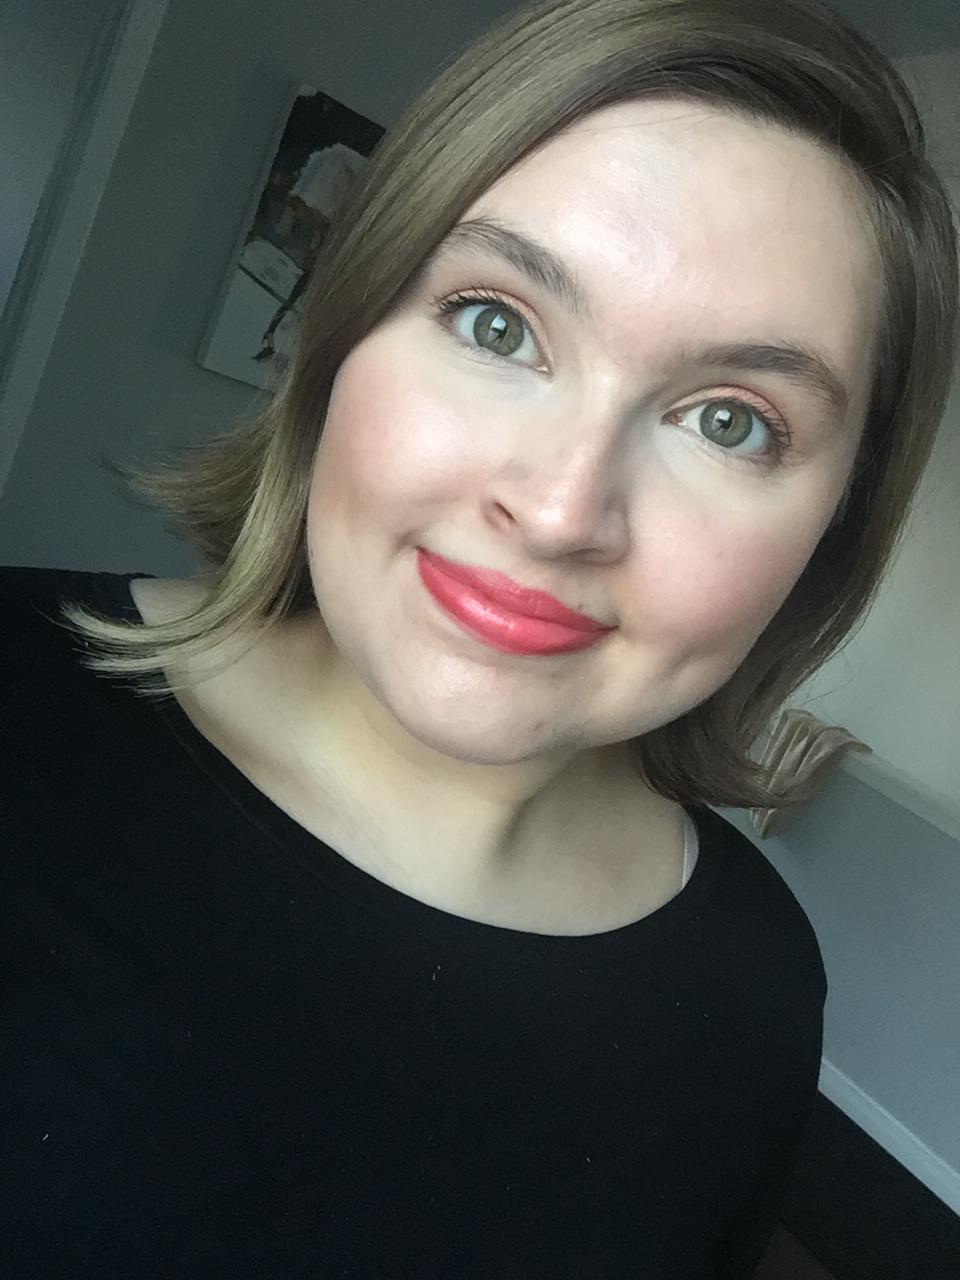 Me wearing the colourpop no filter concealer